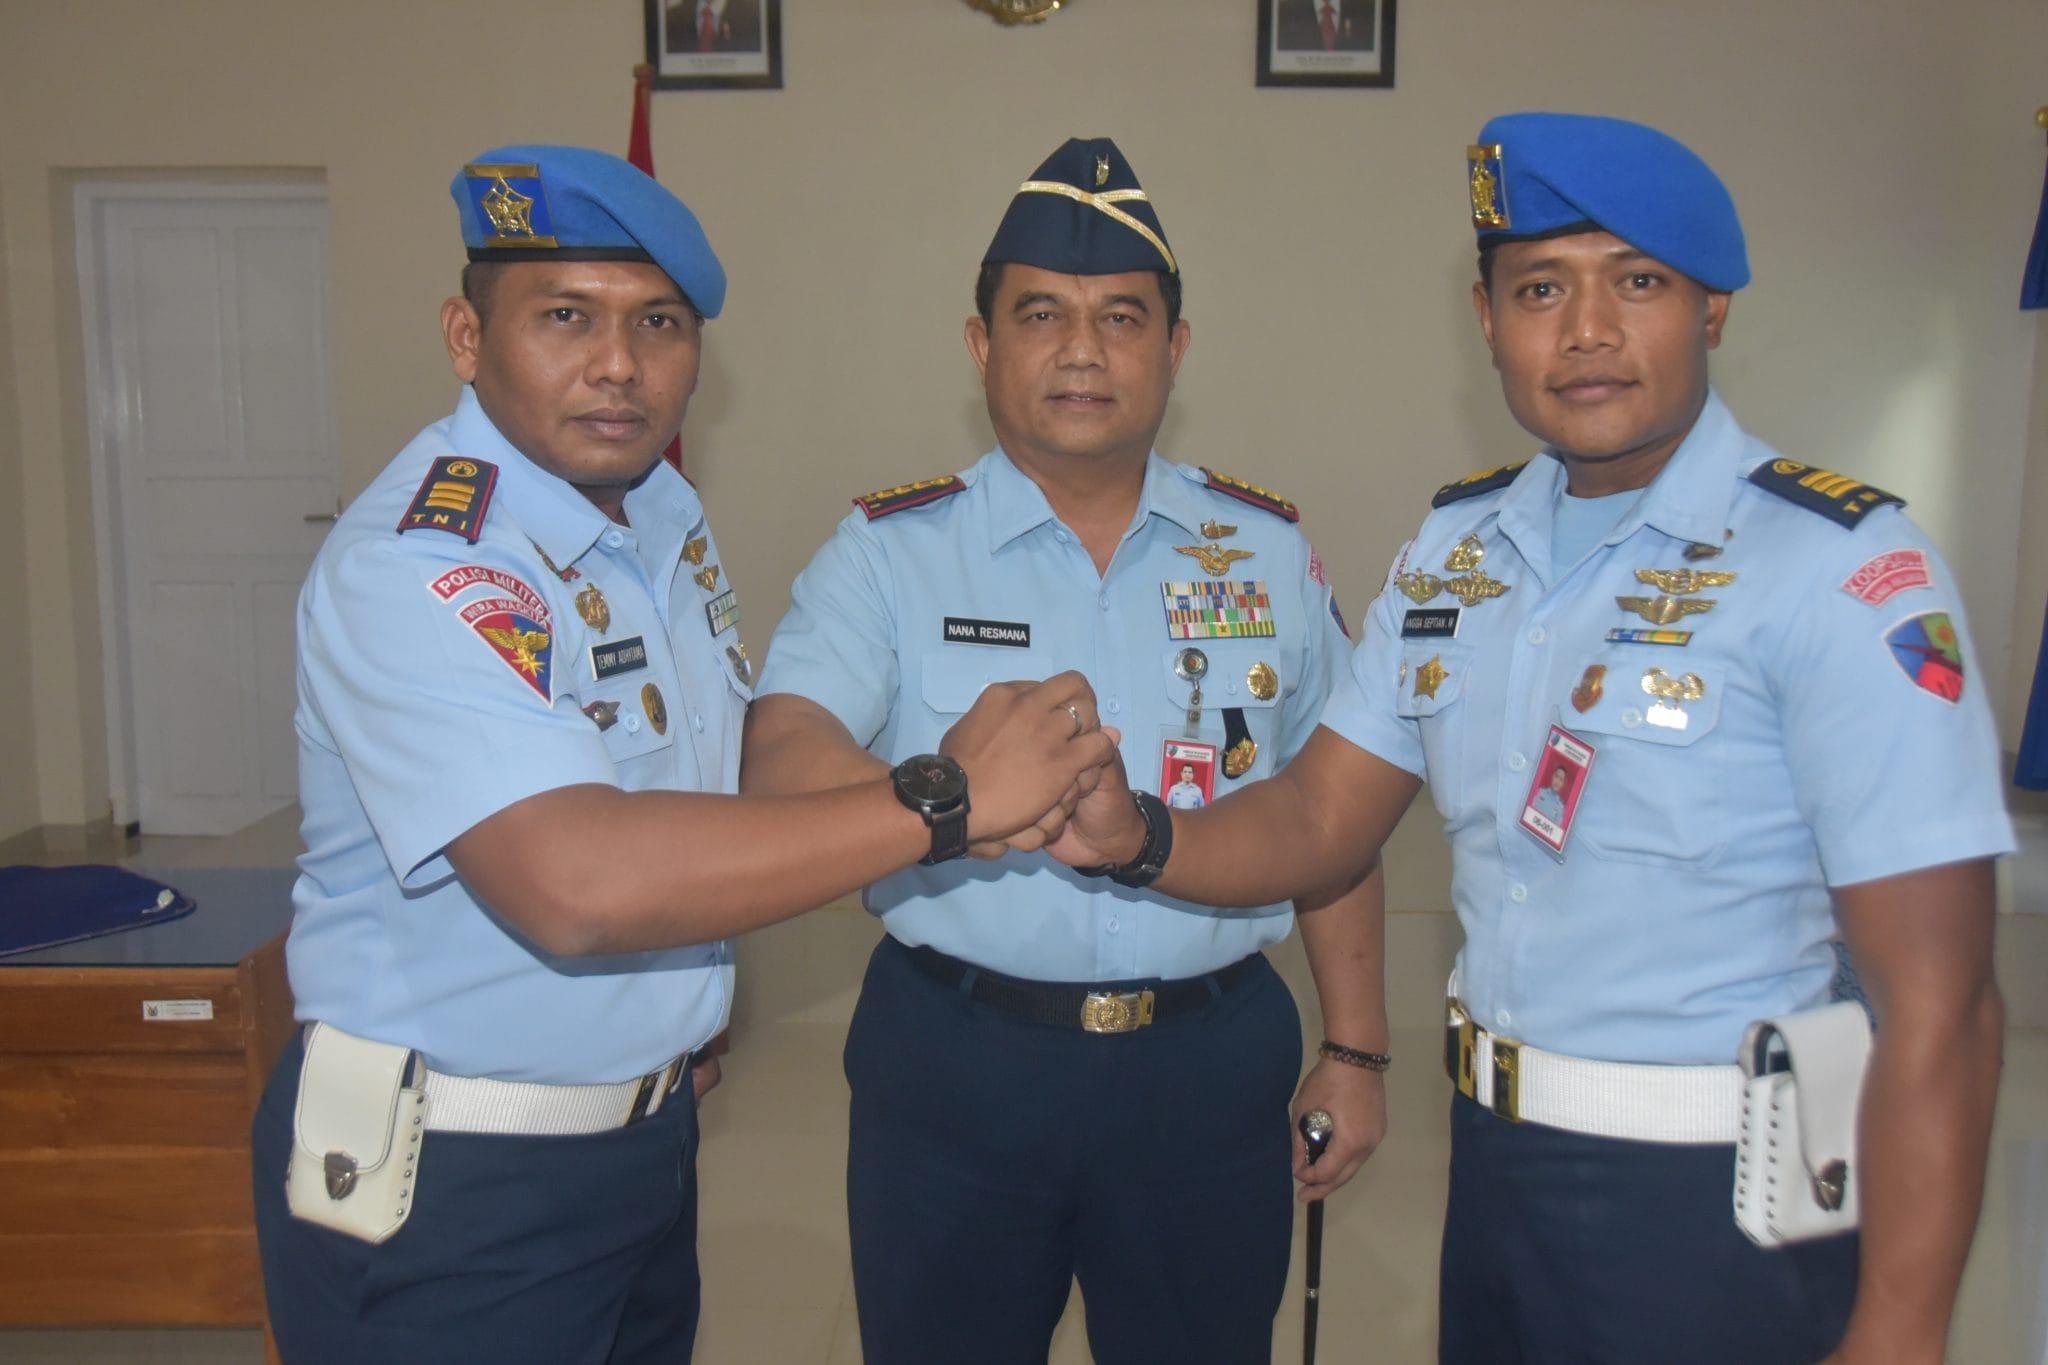 Kapten Pom Temmi Adhytama, S.H Jabat Dansatpom Lanud Haluoleo